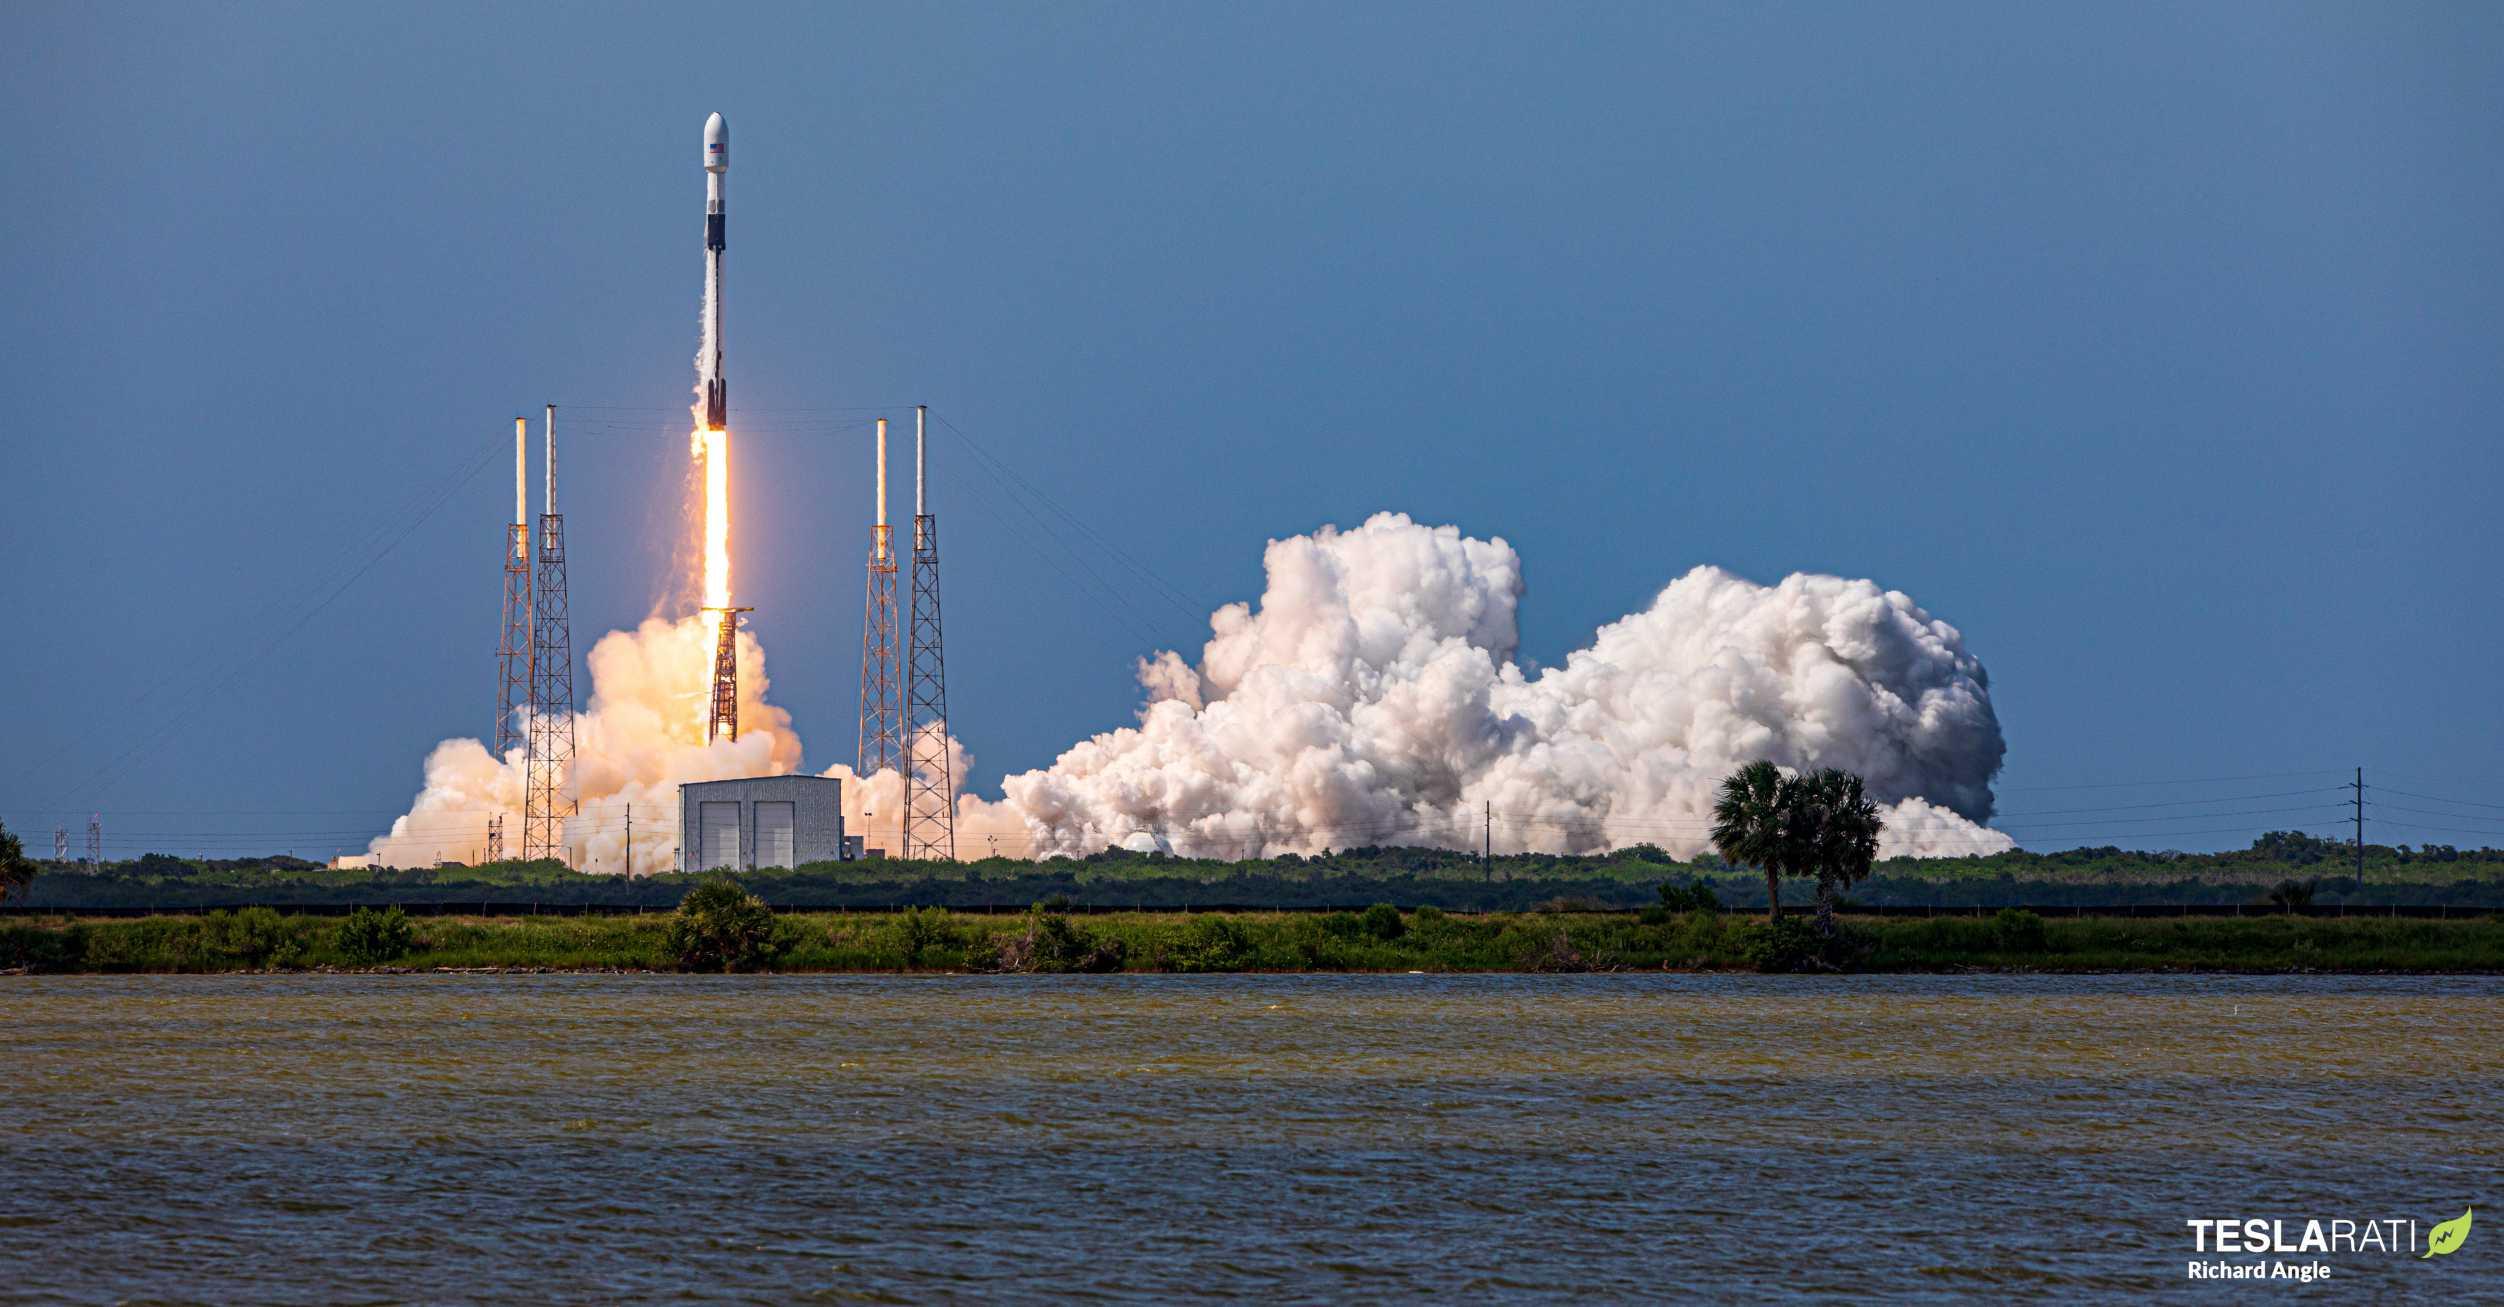 GPS III SV03 Falcon 9 B1060 063020 (Richard Angle) launch 1 crop (c)